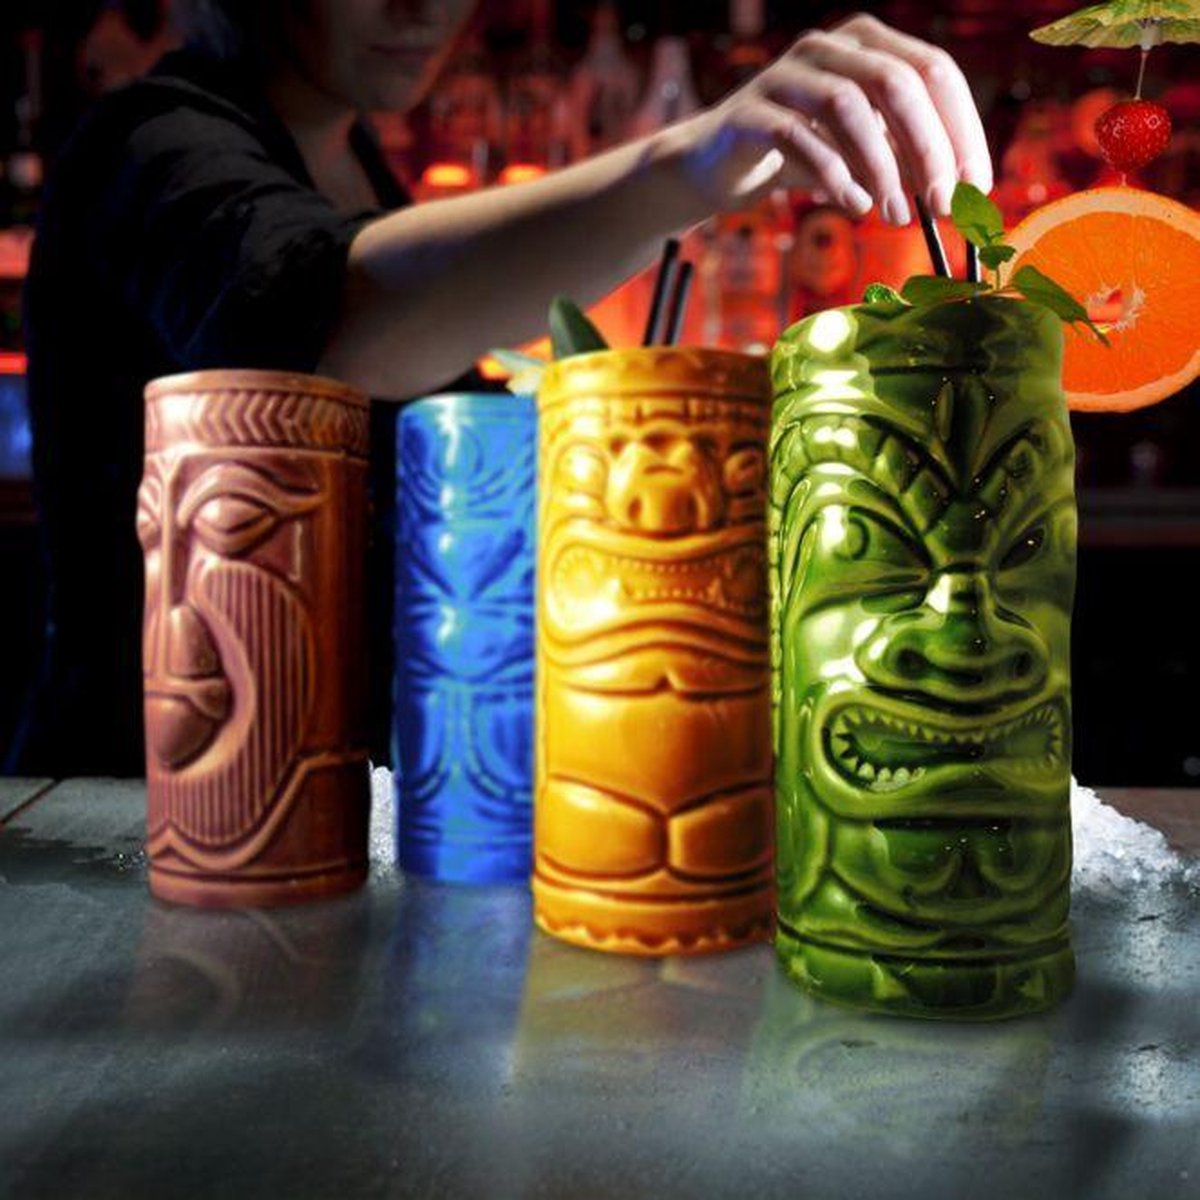 MikaMax Tiki Mugs - Beker - Hawaii Decoratie - Mok - 4 Stuks - Groen/Paars/Geel/Blauw